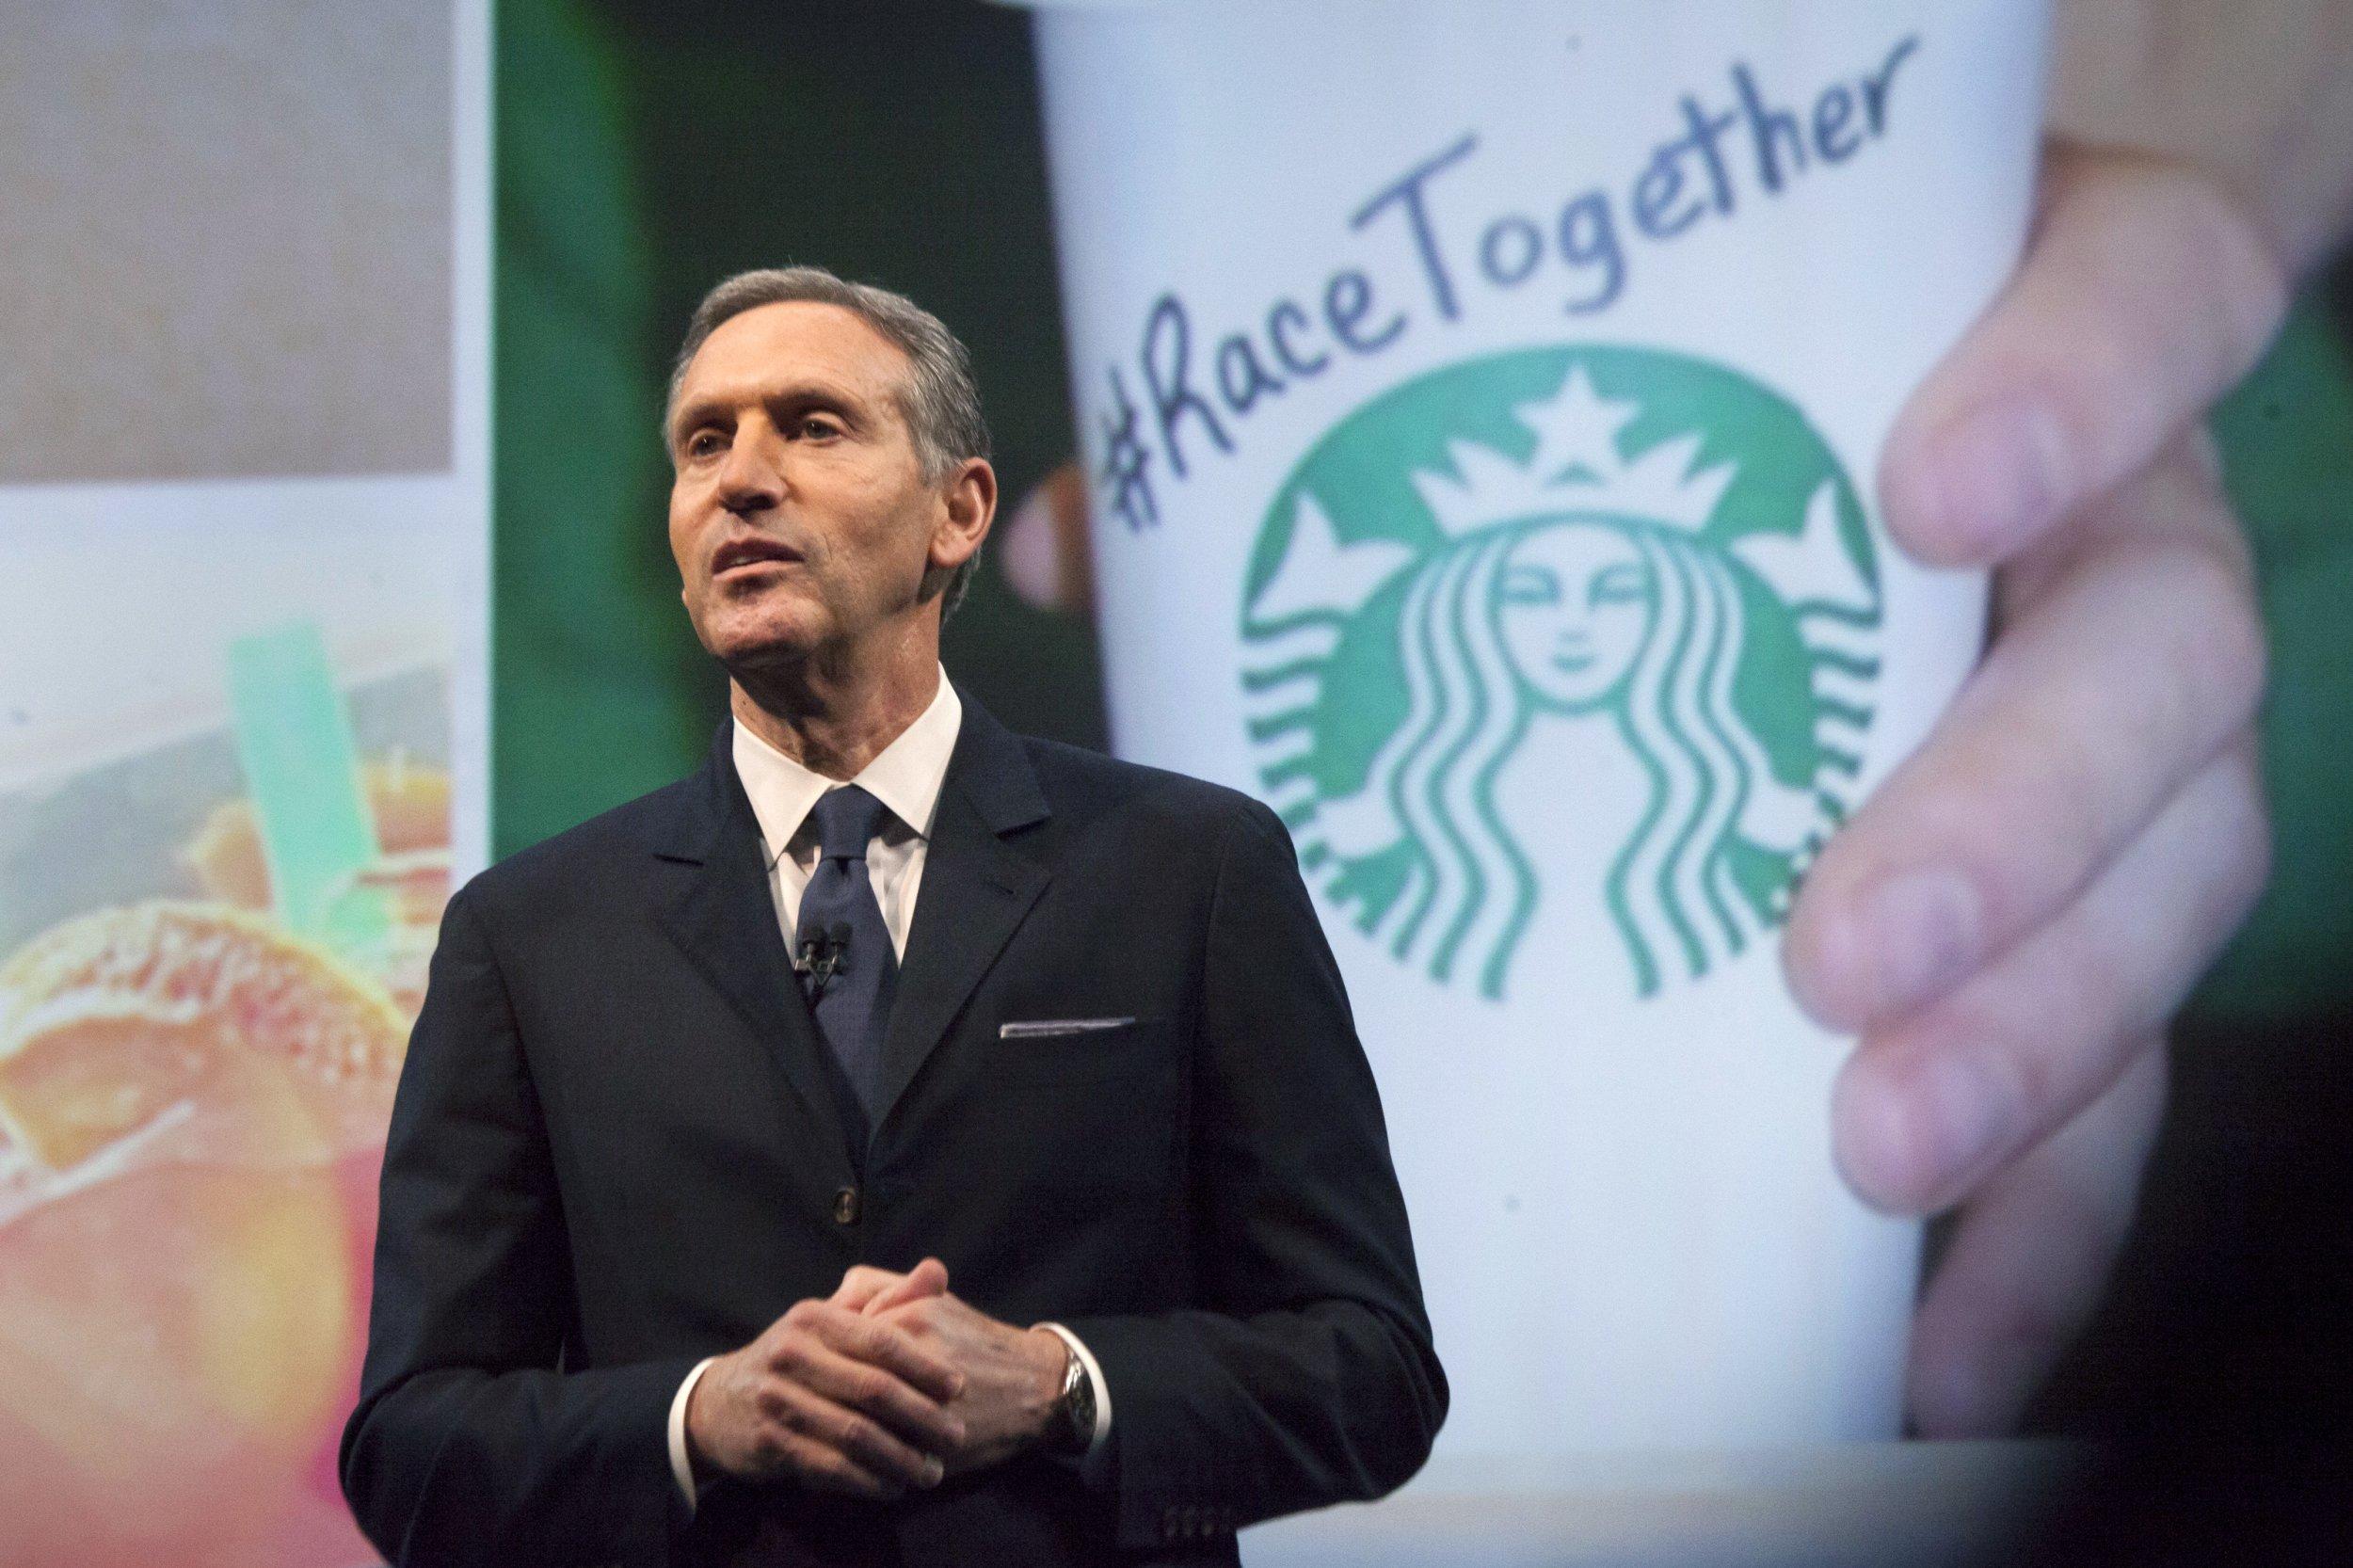 3-23-15 Starbucks Race Together